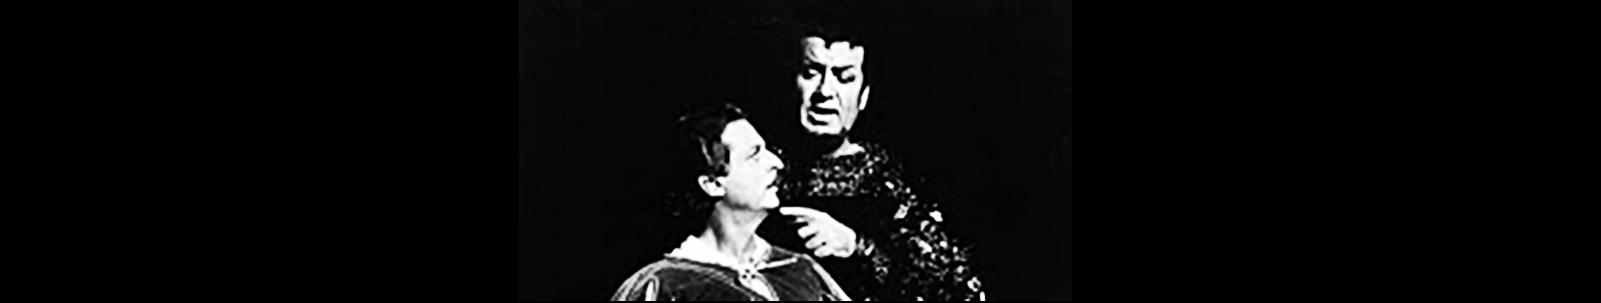 Ghiarov y Kraus en Faust